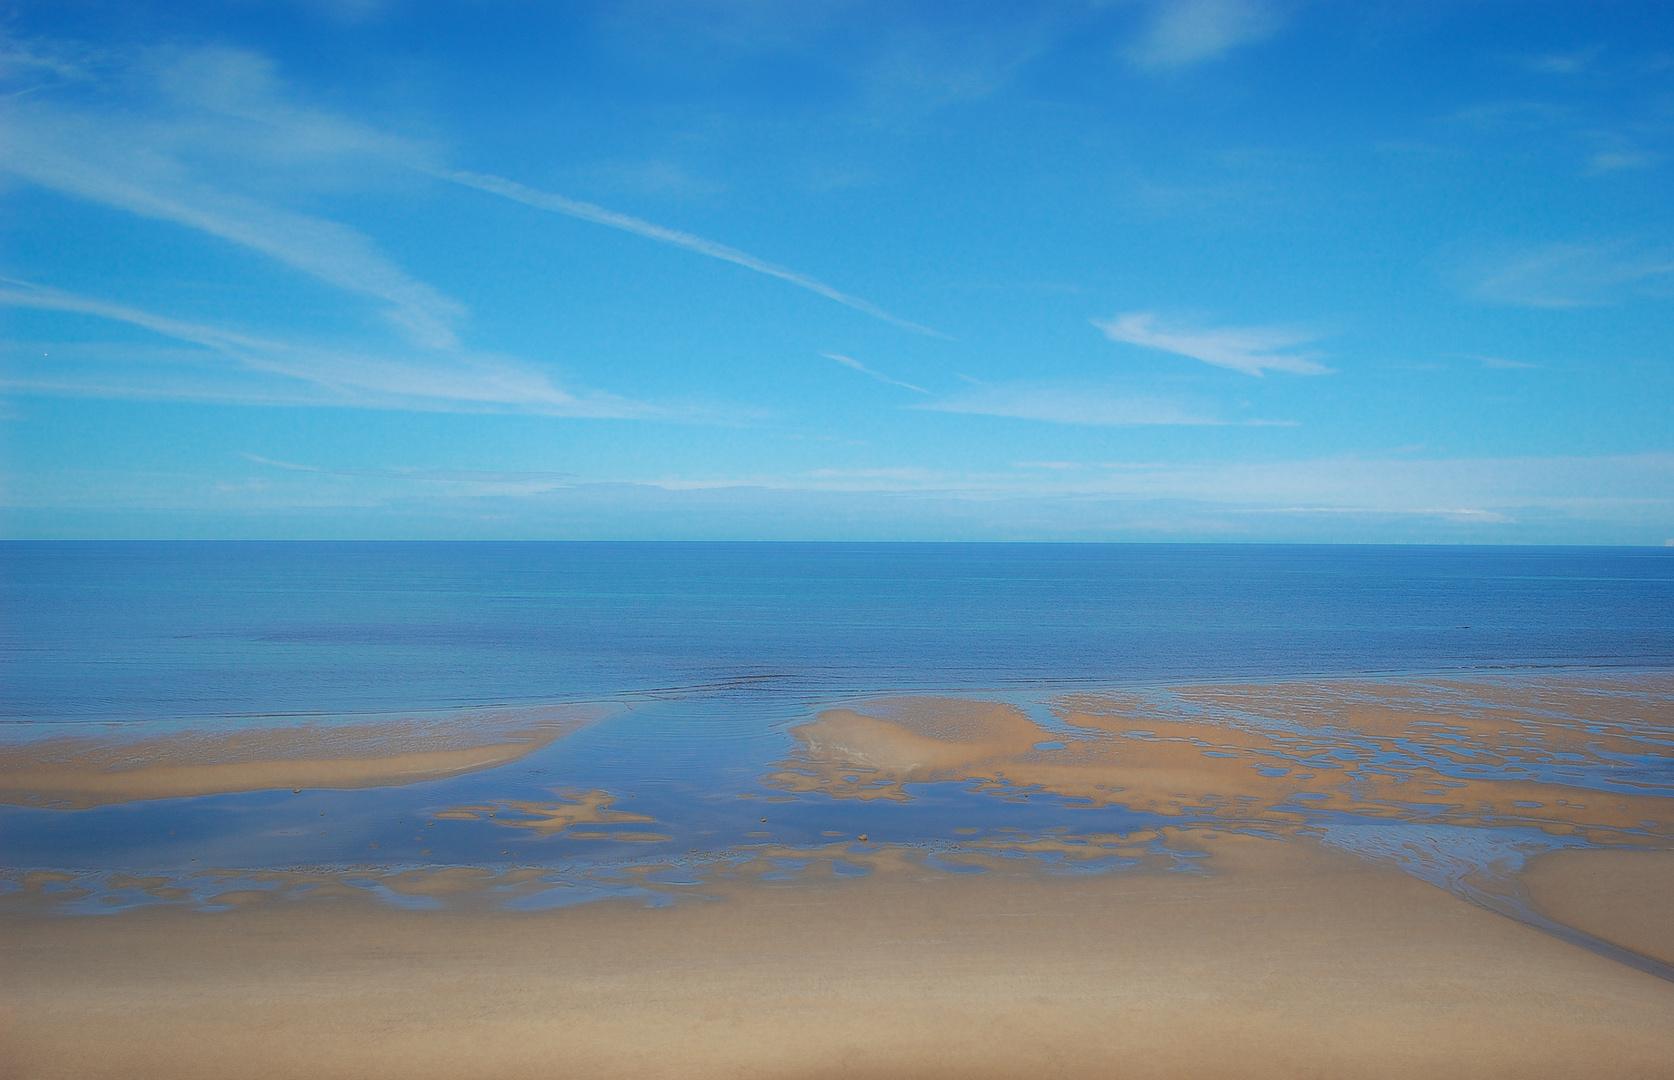 Blicke schweiften über das ruhige Meer..